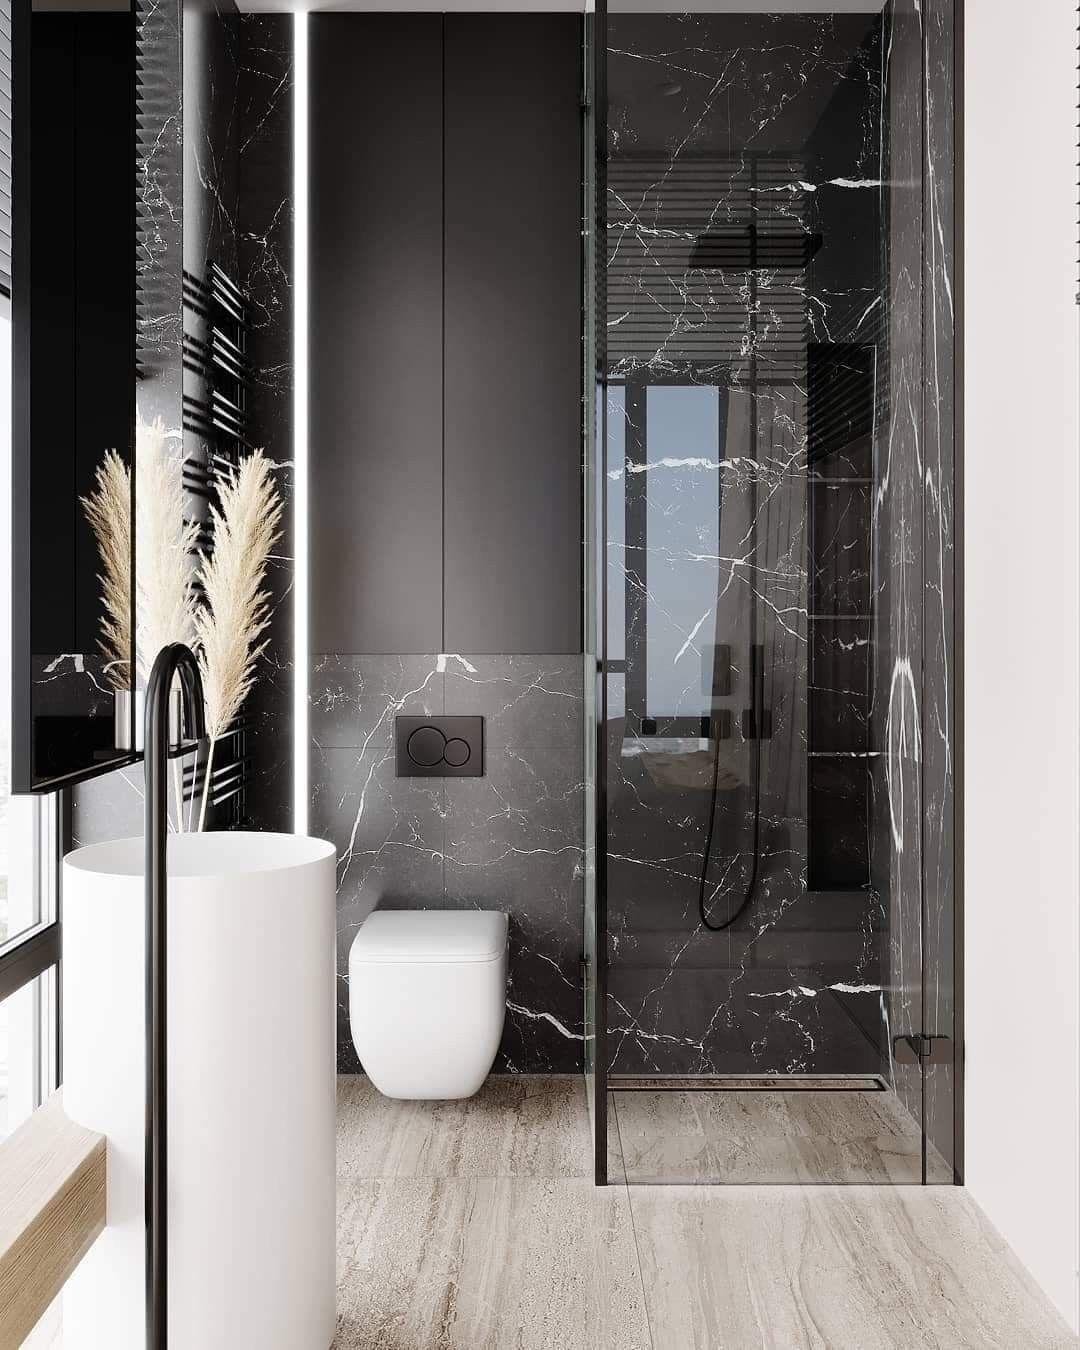 Pin By Silvia Dragos On Salle De Bain Design Bathroom Design Small Bathroom Design Luxury Bathroom Layout